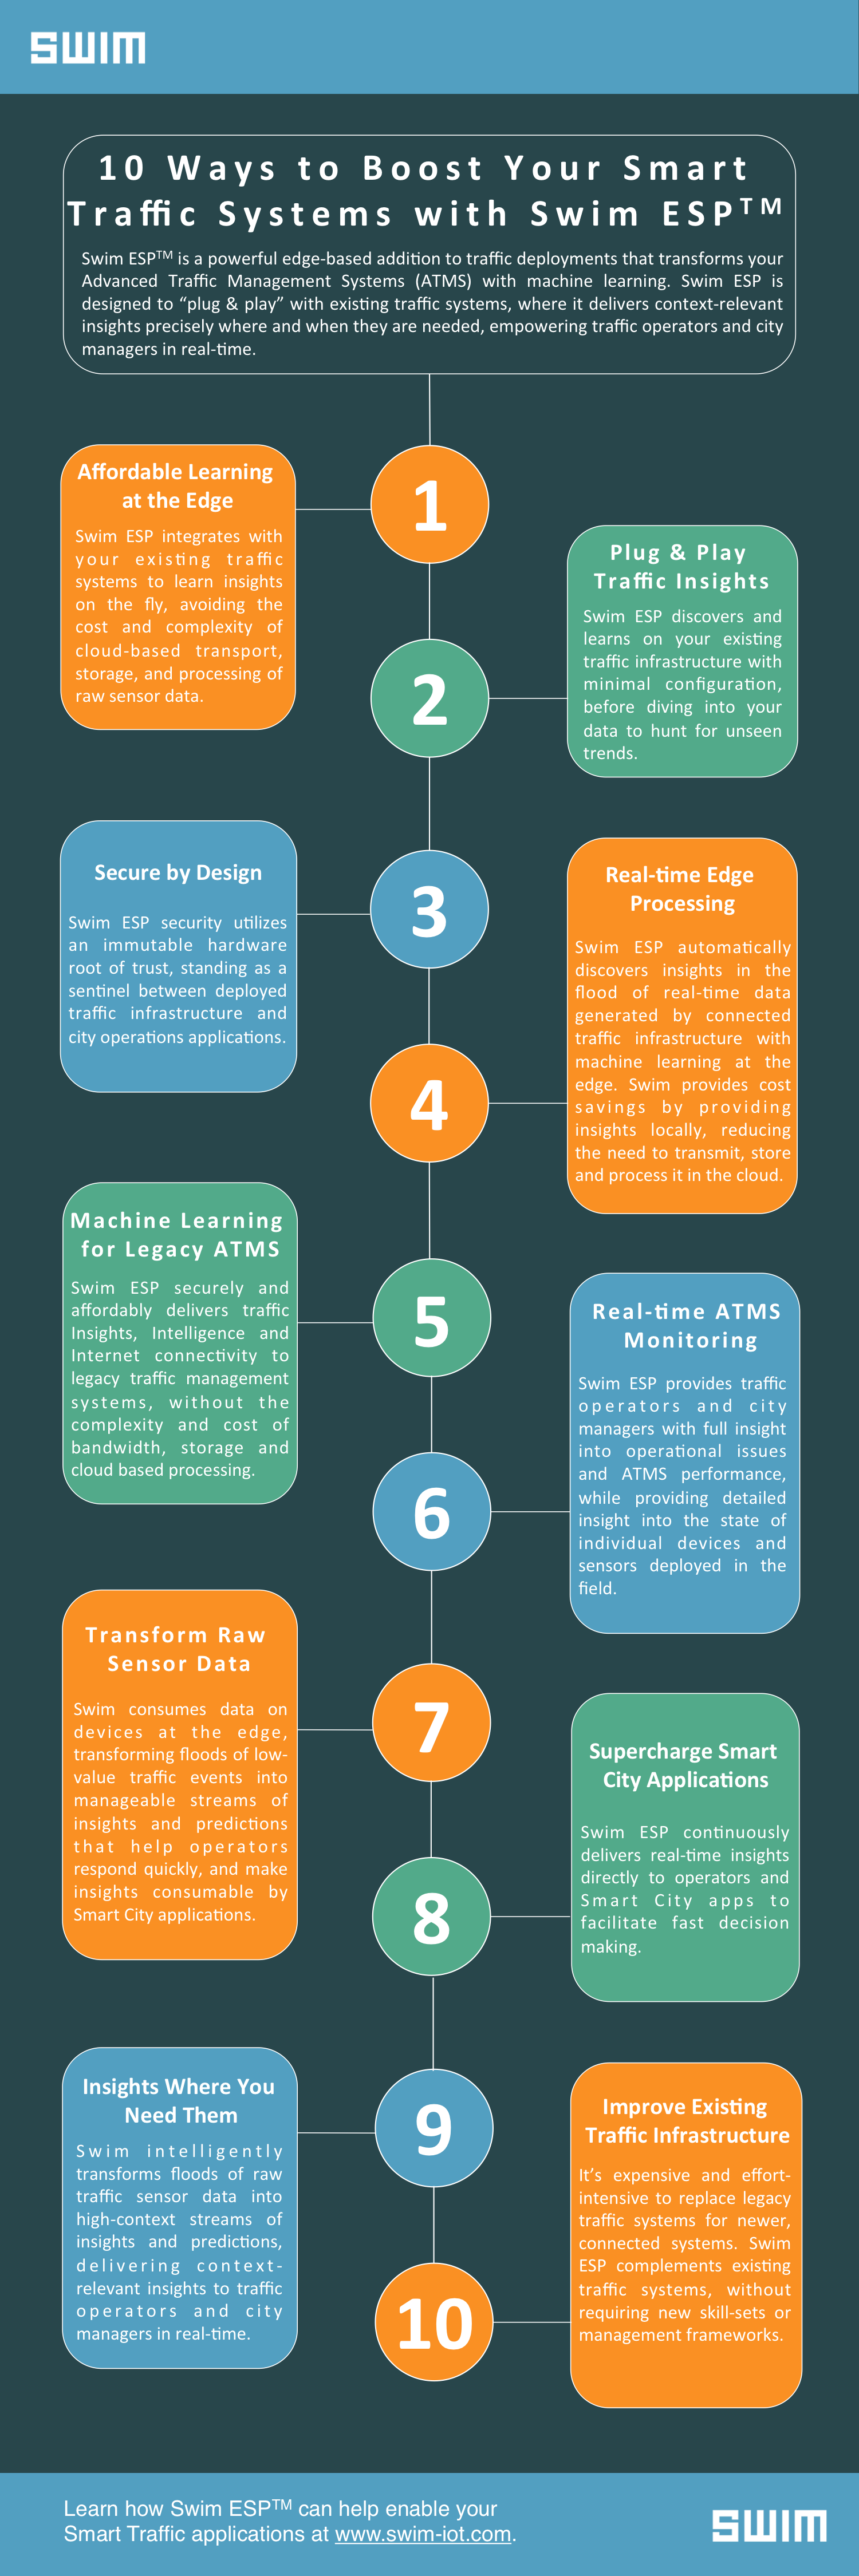 Swim_10 Ways to Boost Your ATMS with Swim ESP - Infographic